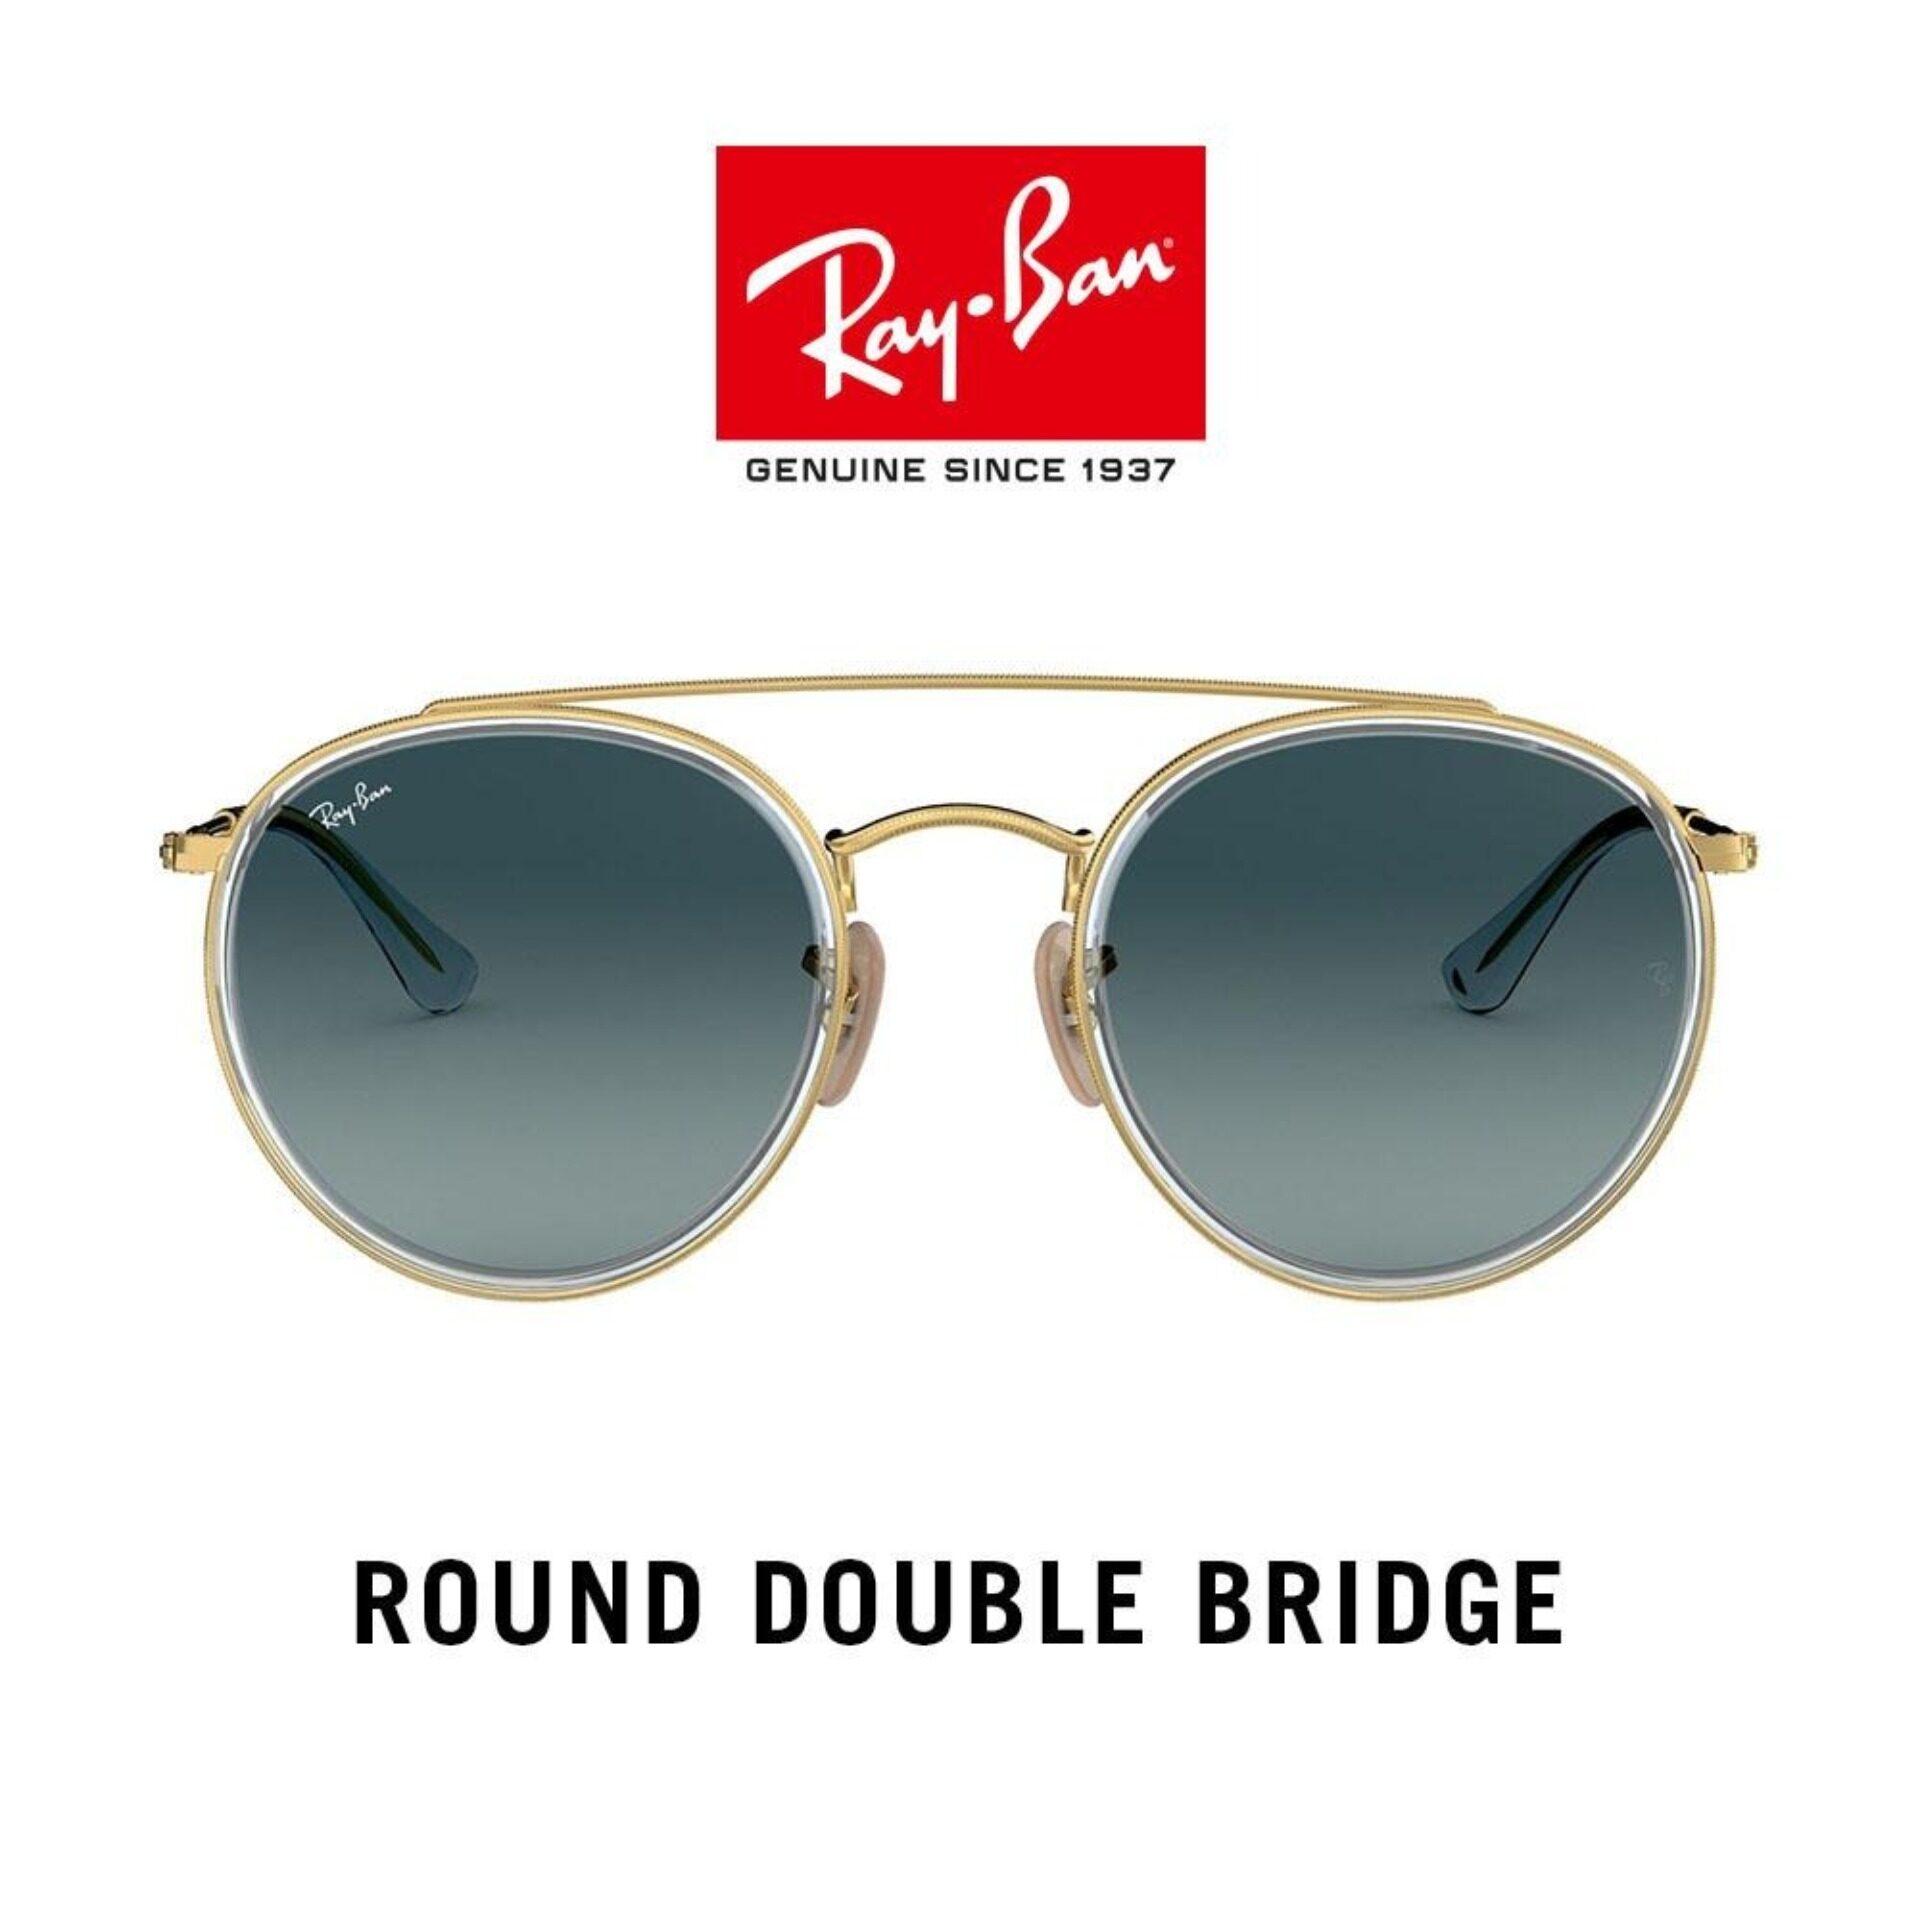 Ray-Ban Round Double Bridge - Rb3647n 91233m  แว่นตากันแดด.